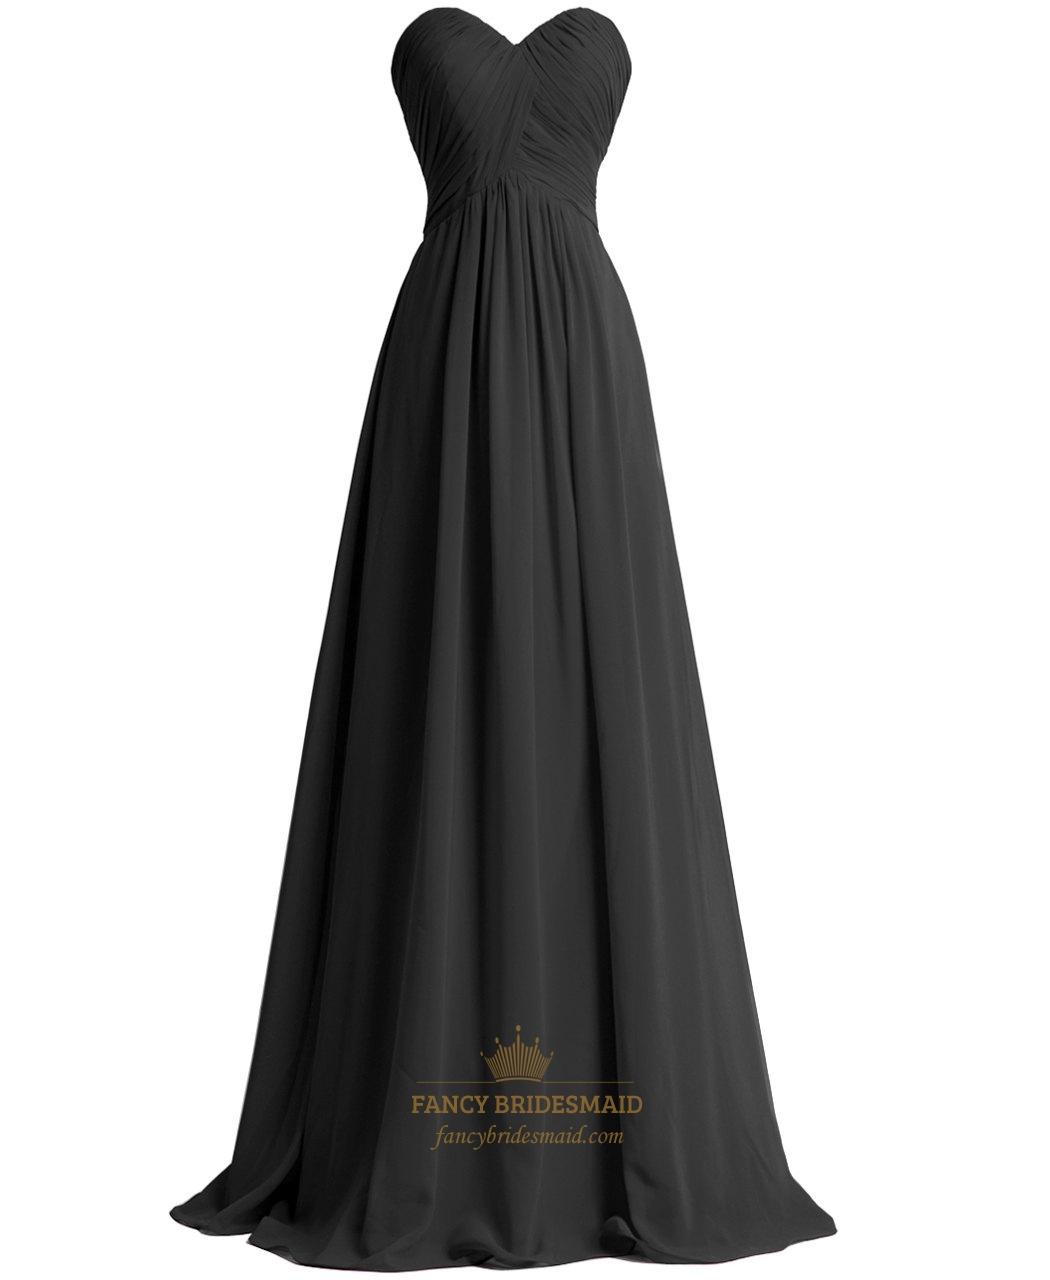 ba89b5b46fc9 Black Empire Waist Strapless Sweetheart Chiffon Pleated Bridesmaid Dress  SKU -NW621